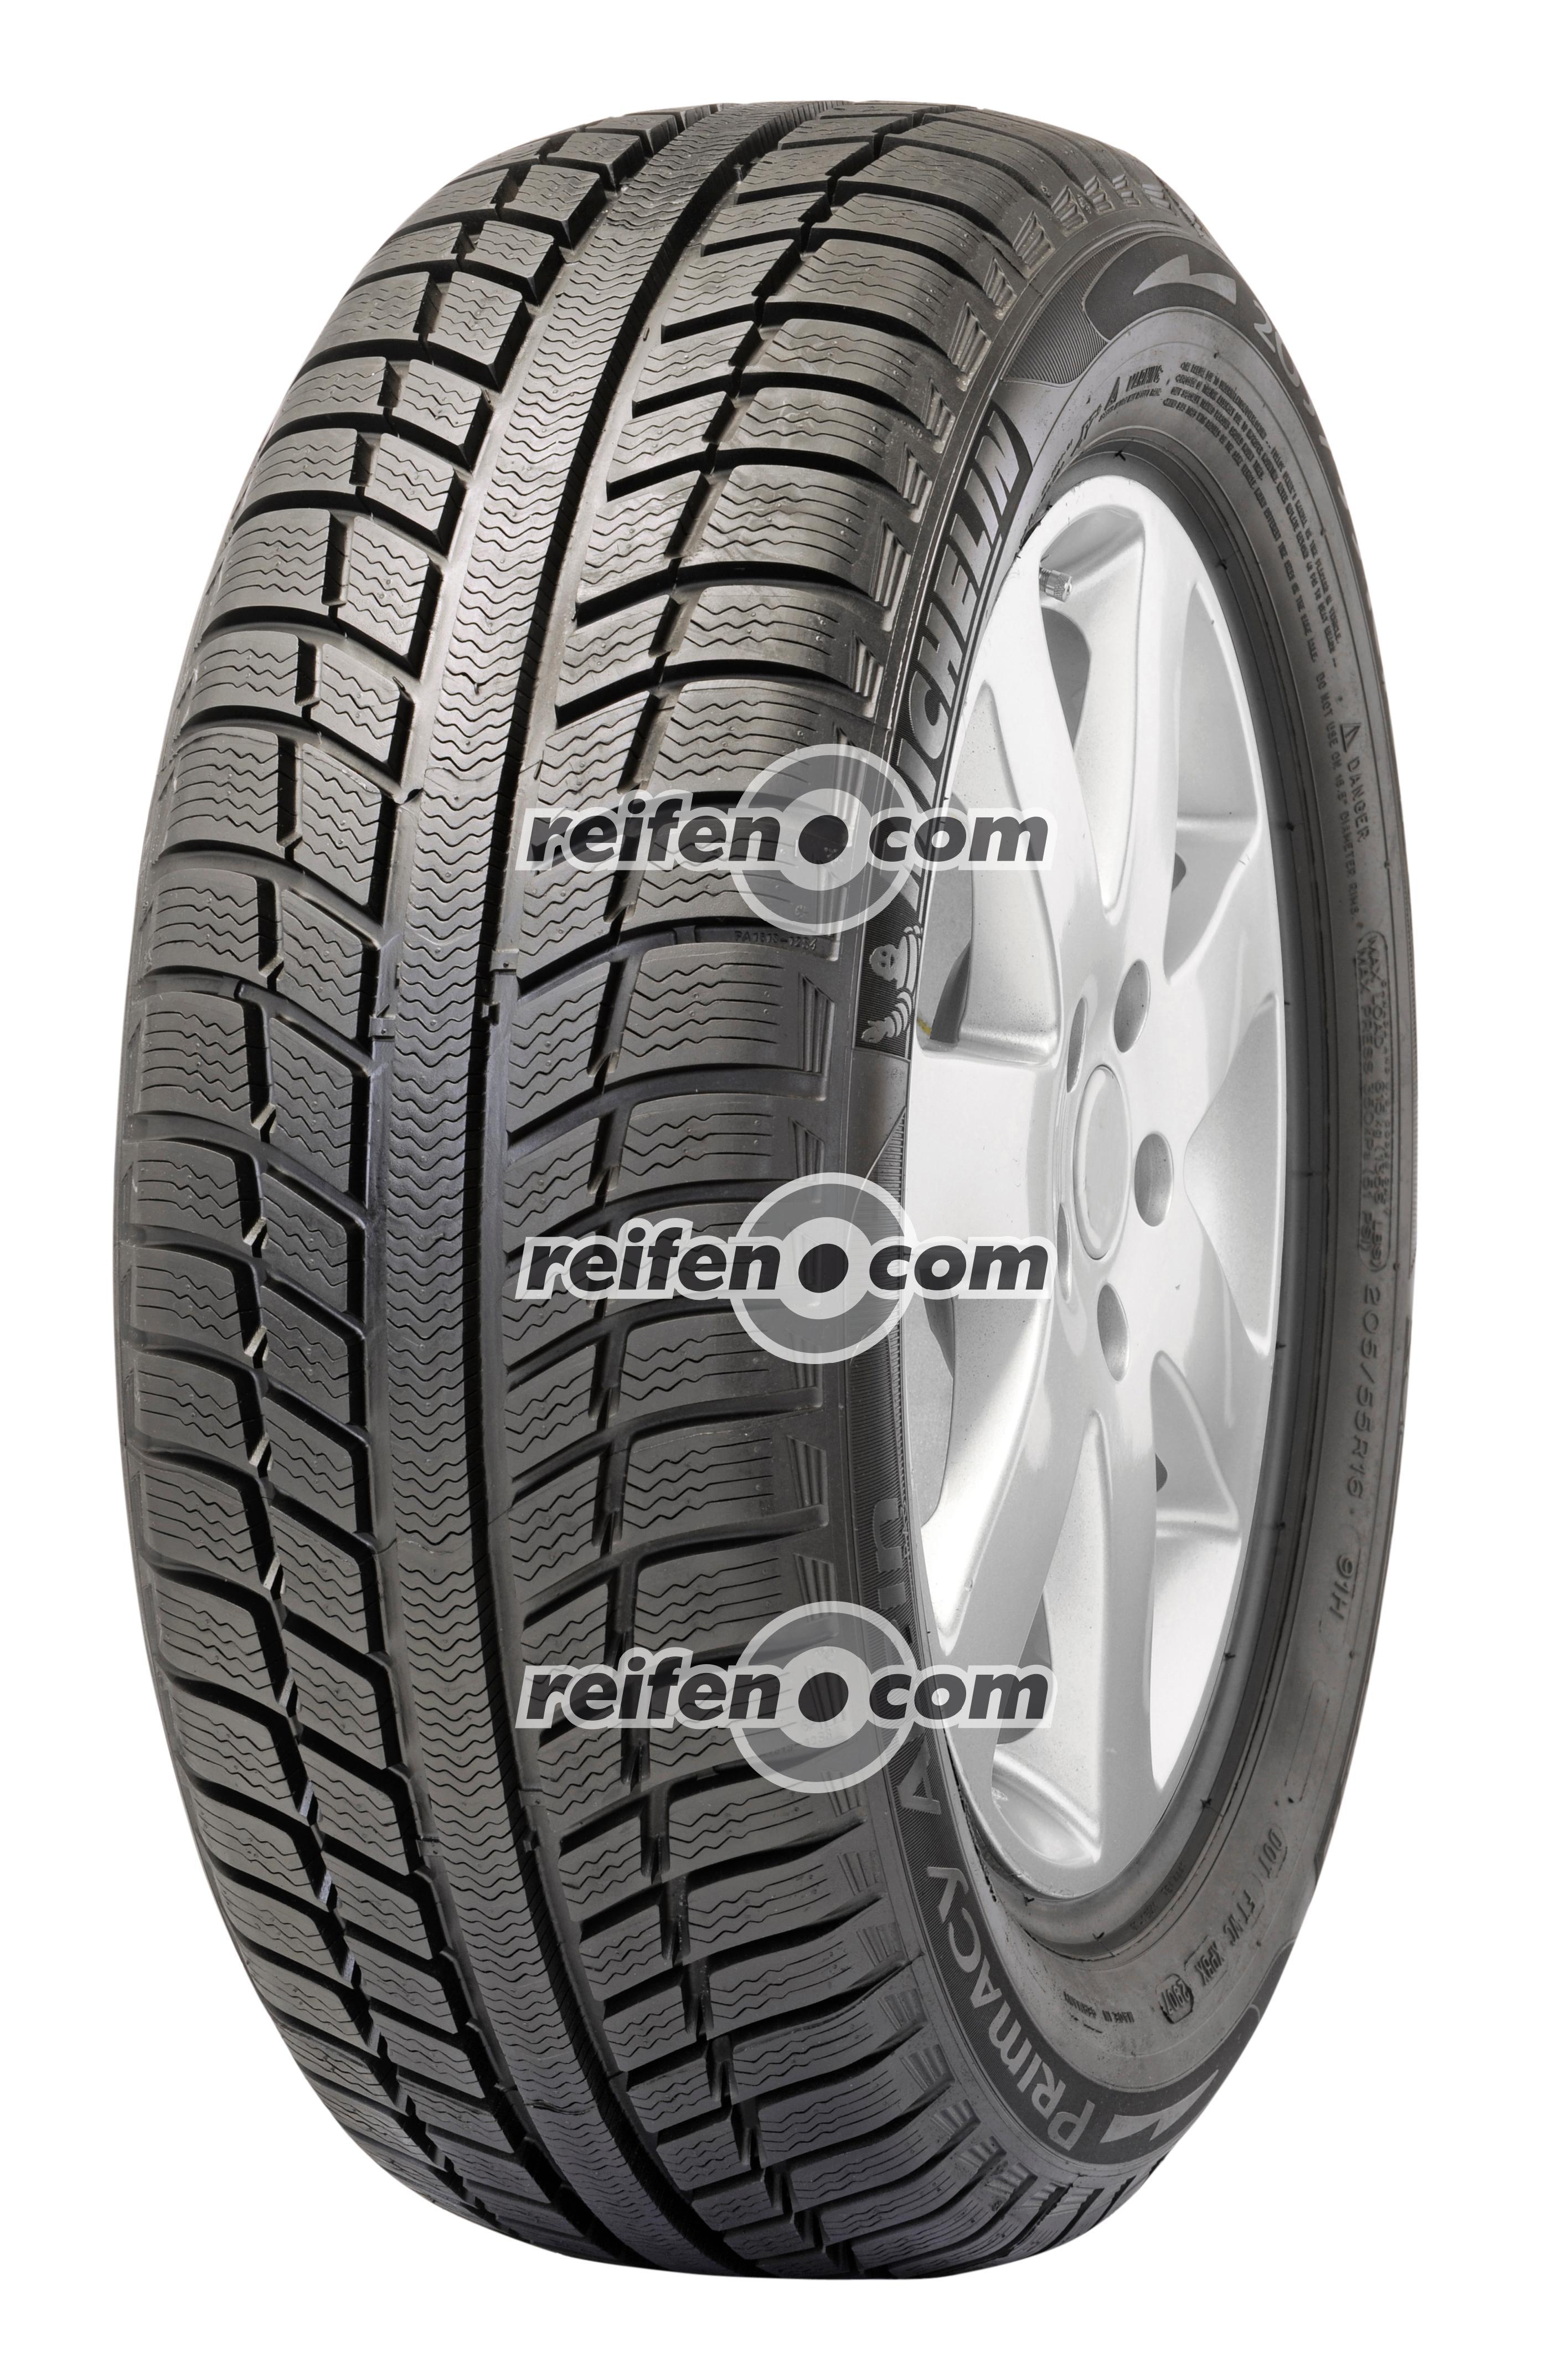 online shop brand tyre complete wheels and rims superfavourably. Black Bedroom Furniture Sets. Home Design Ideas